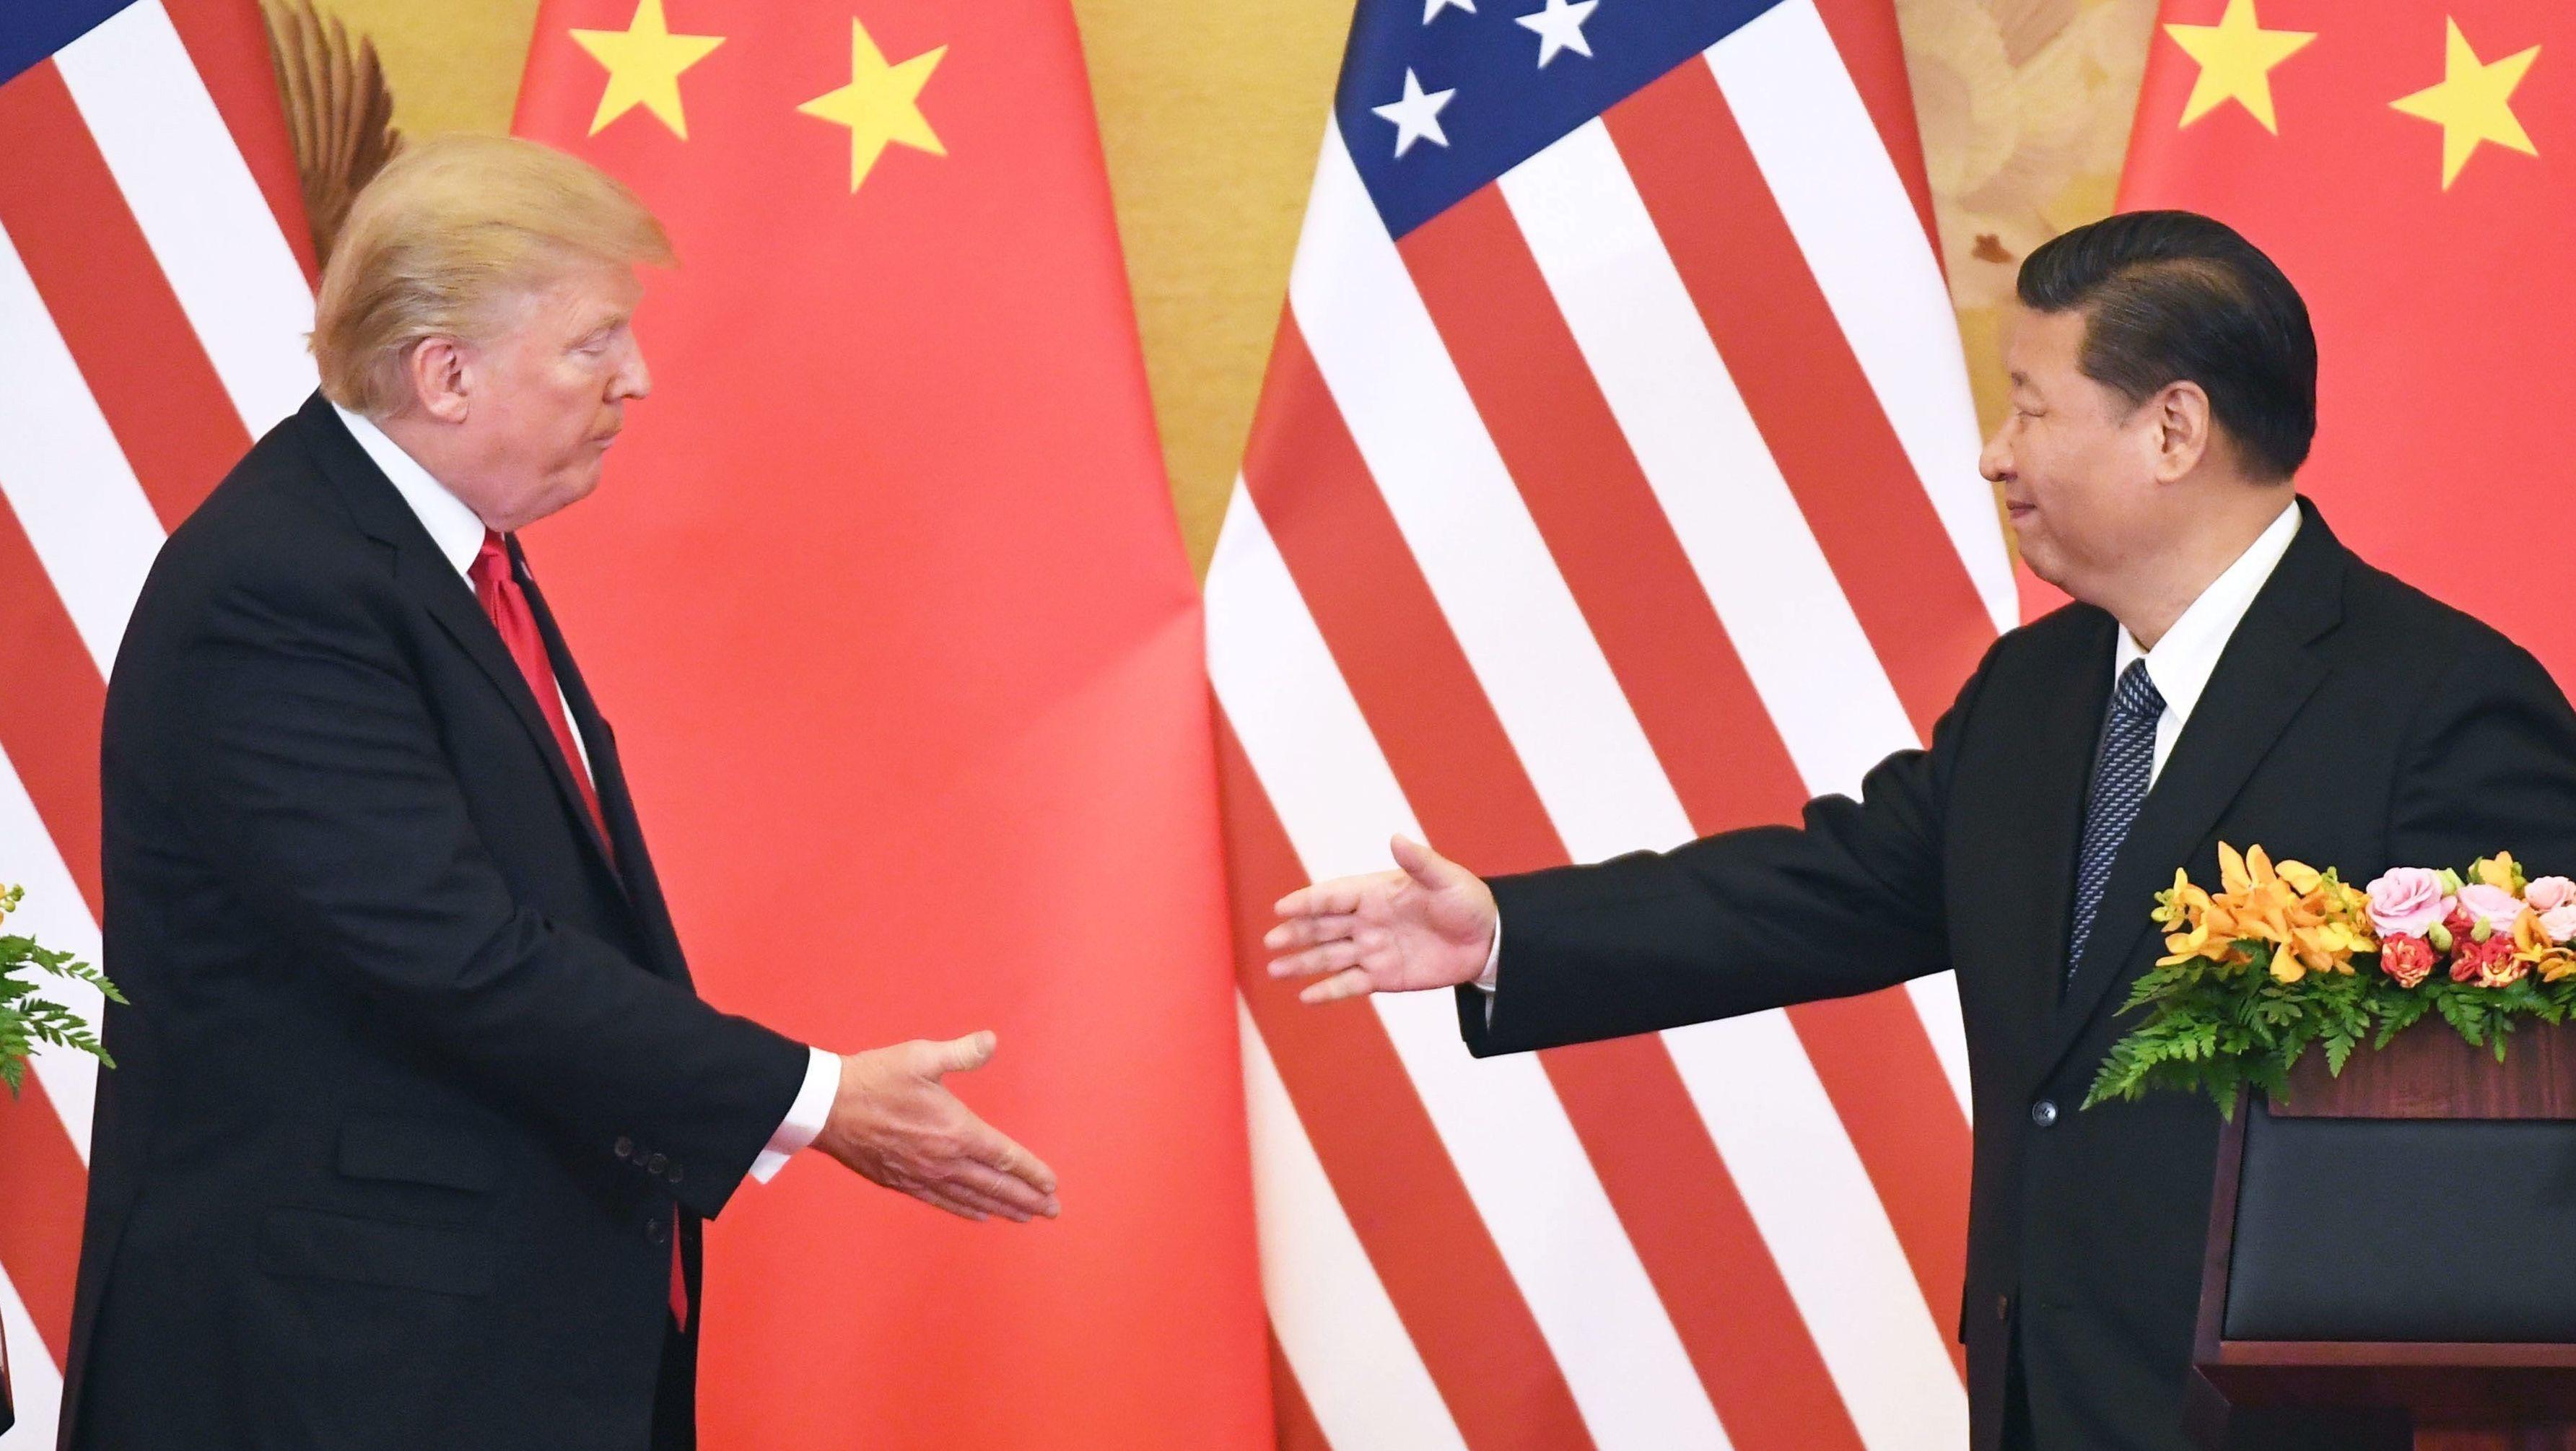 Donald Trump und Chinas Staatschef Xi Jinping